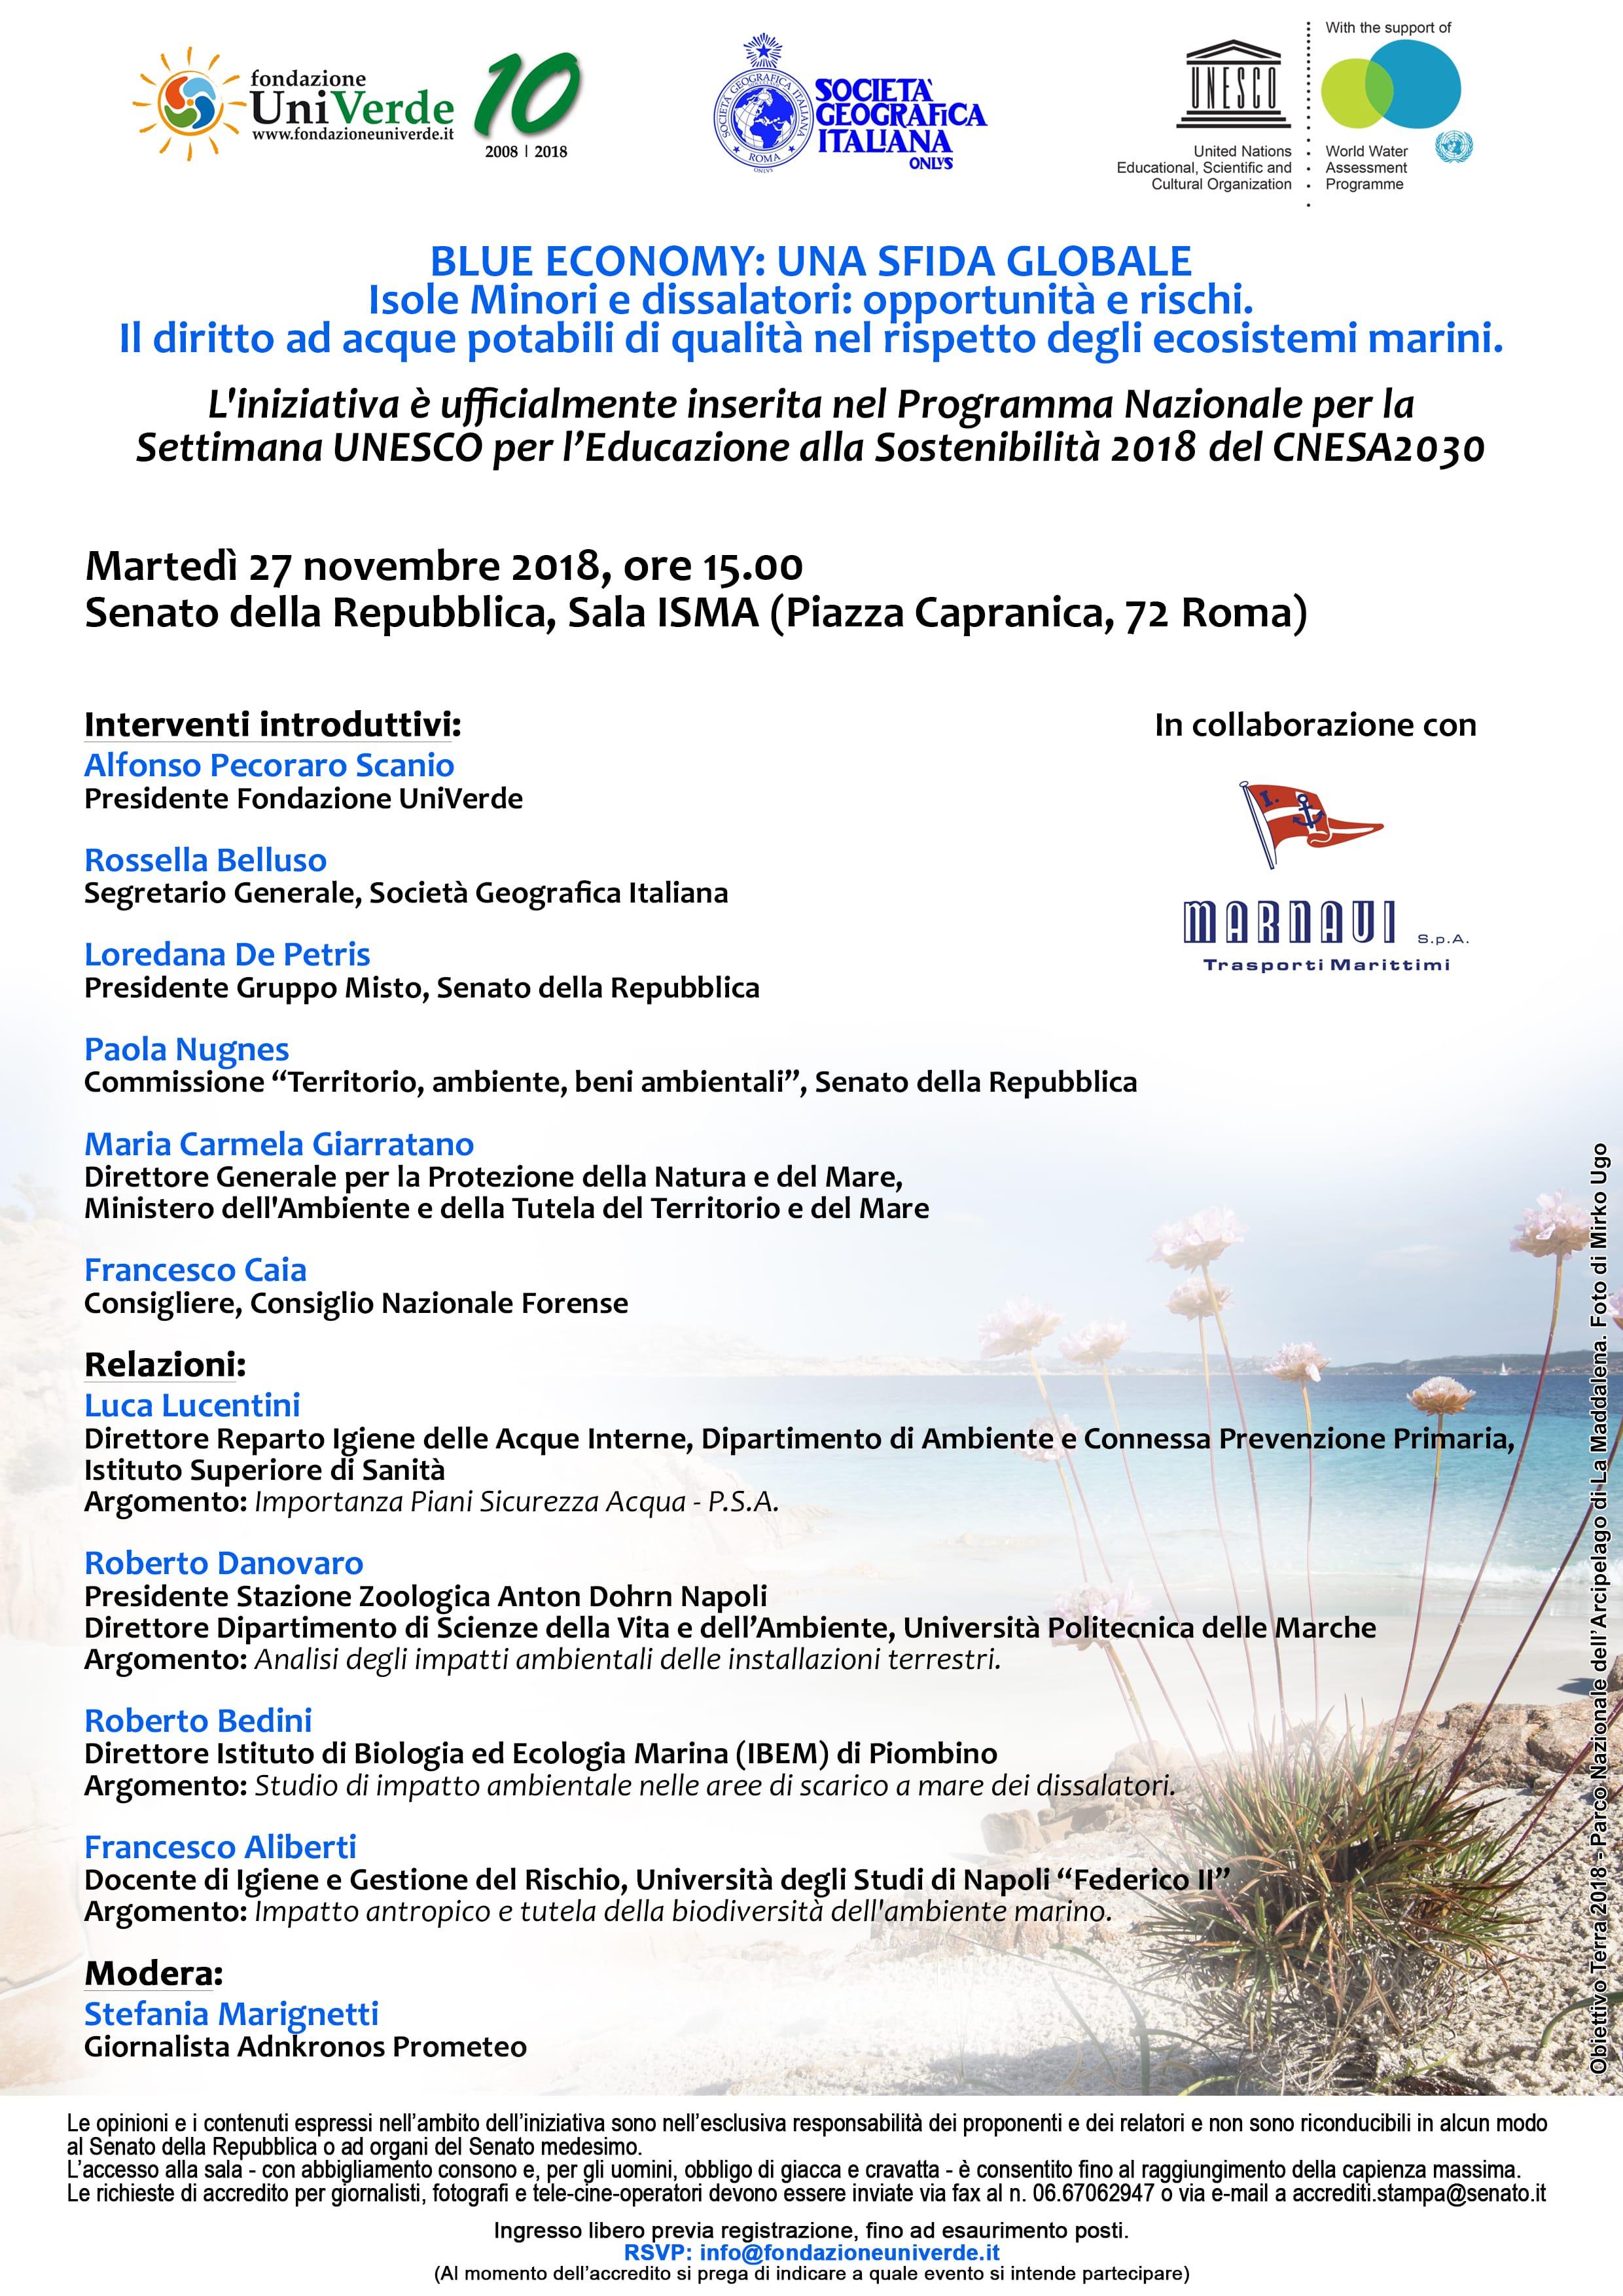 Roma, 27 novembre 2018 - SENATO, Sala ISMA